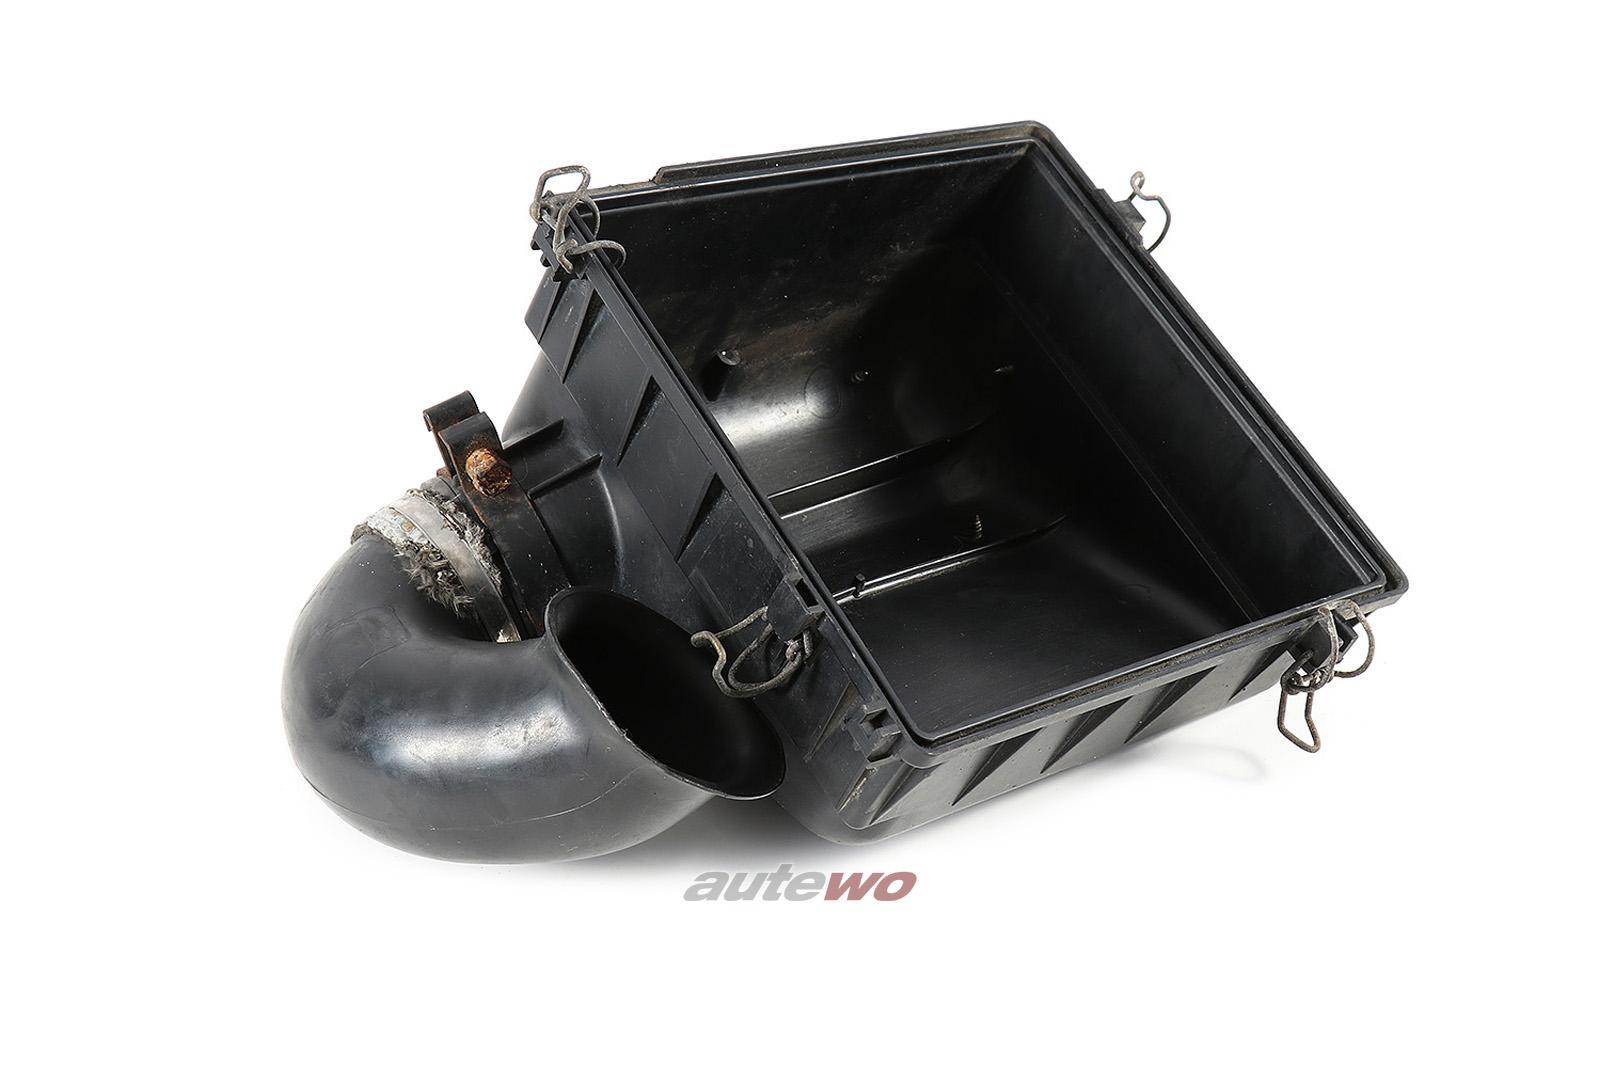 034133837AJ Audi 100/200 Typ 44 2.2l 10V Turbo Luftfilterkastenunterteil